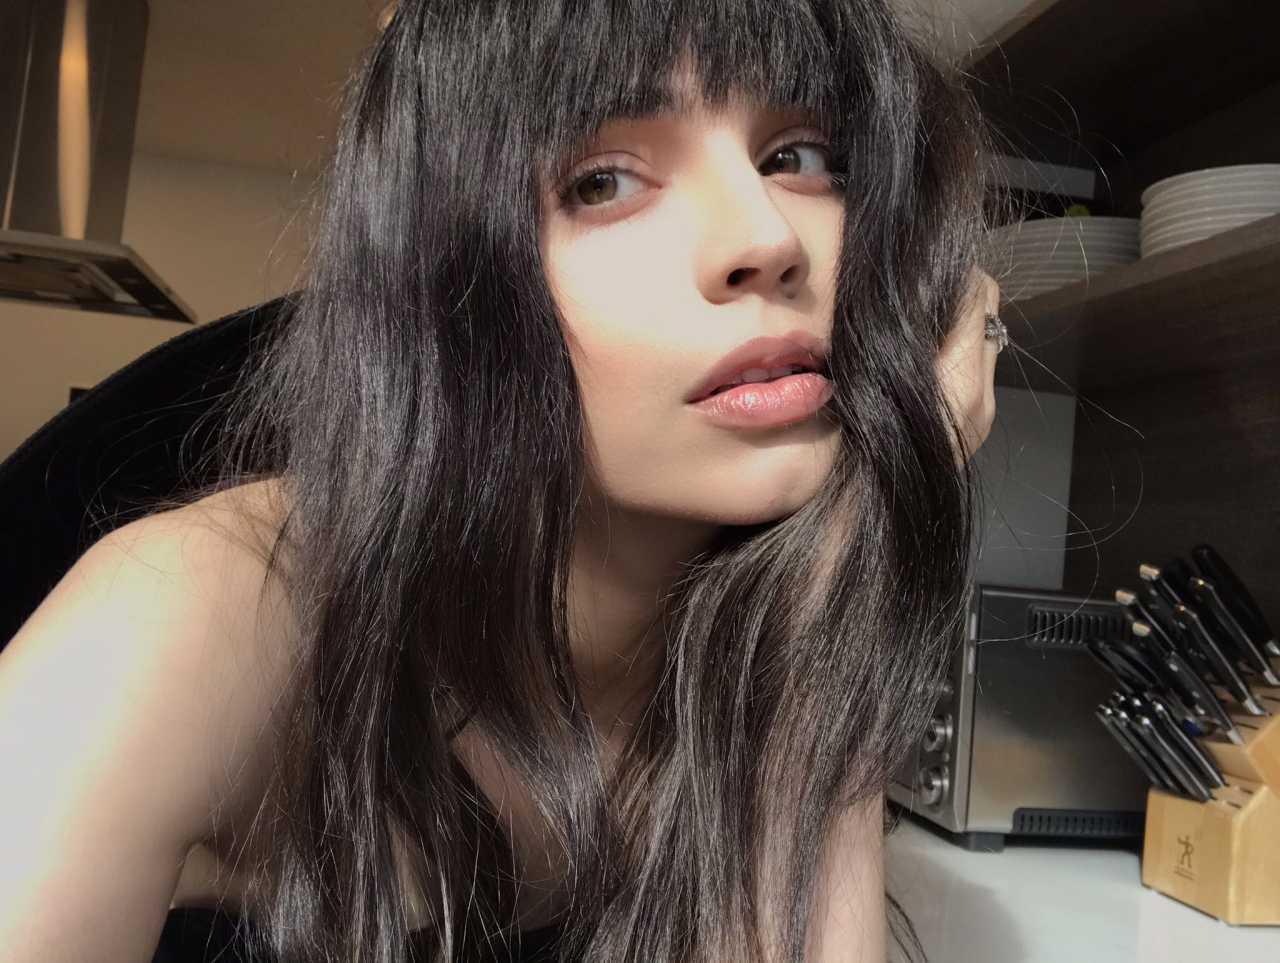 Sofia Carson 2020 : Sofia Carson – Instagram and social media pics-14